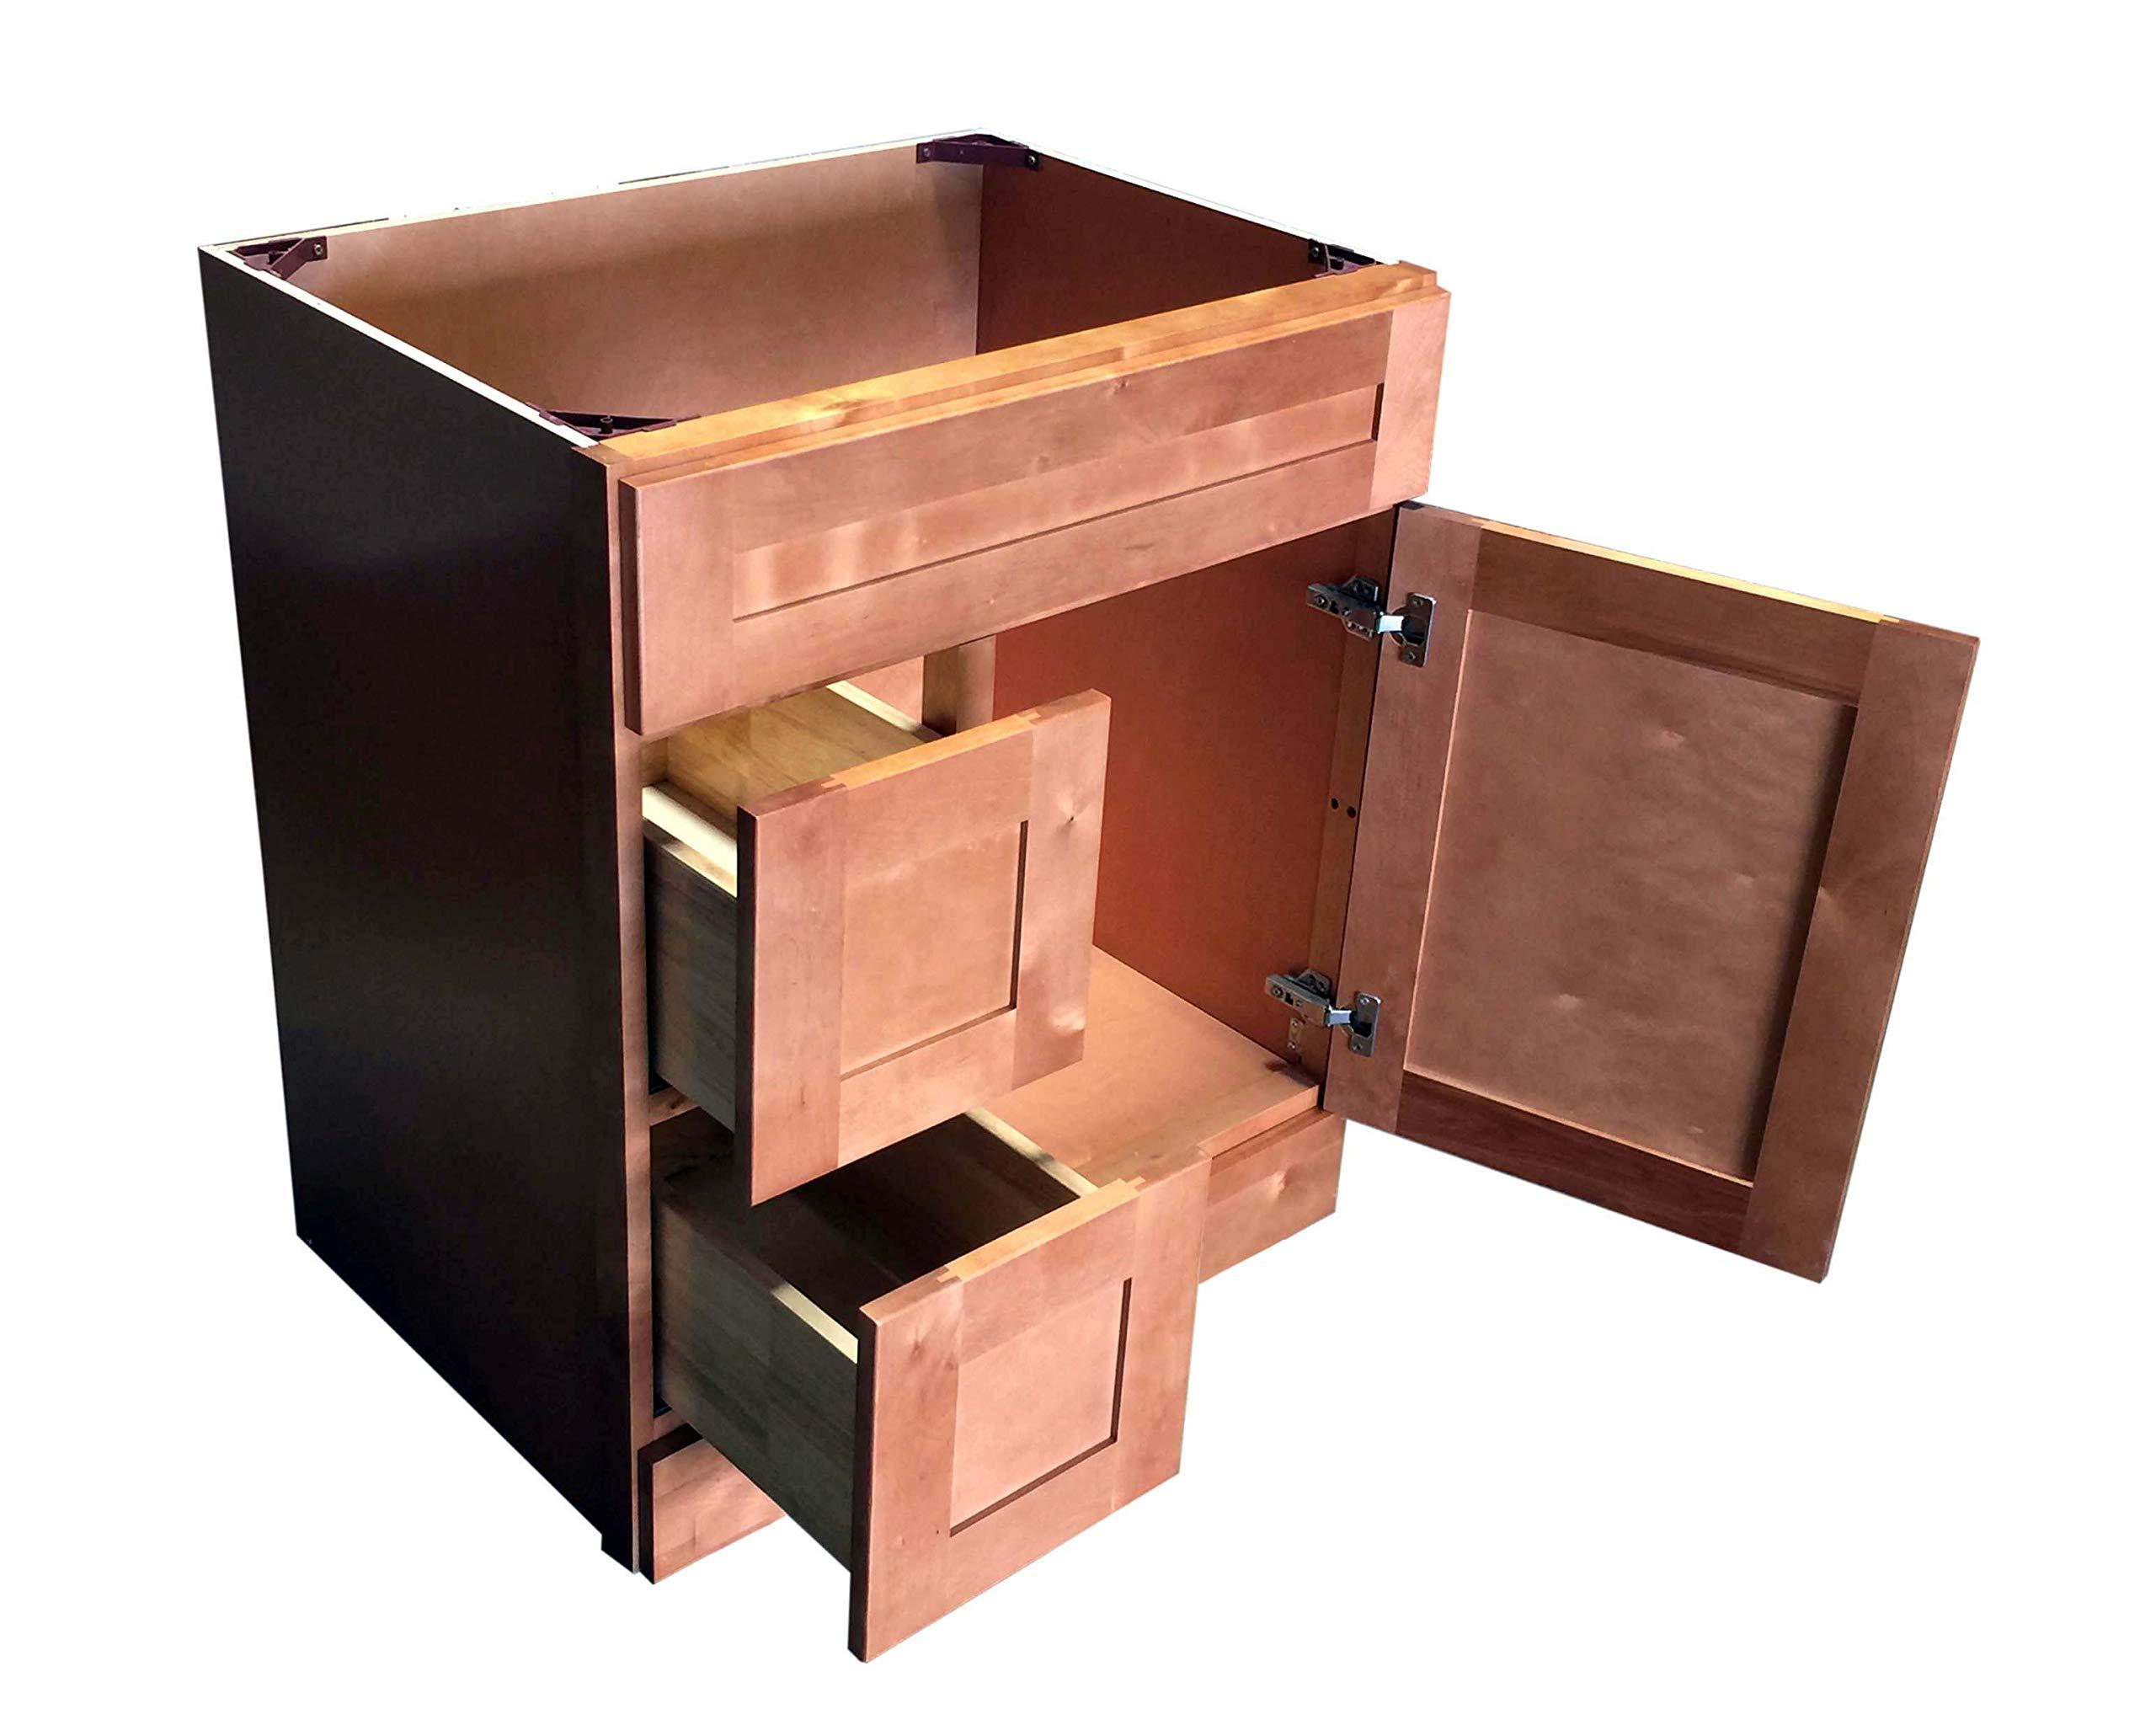 New Maple Shaker Single-sink Bathroom Vanity Base Cabinet ...